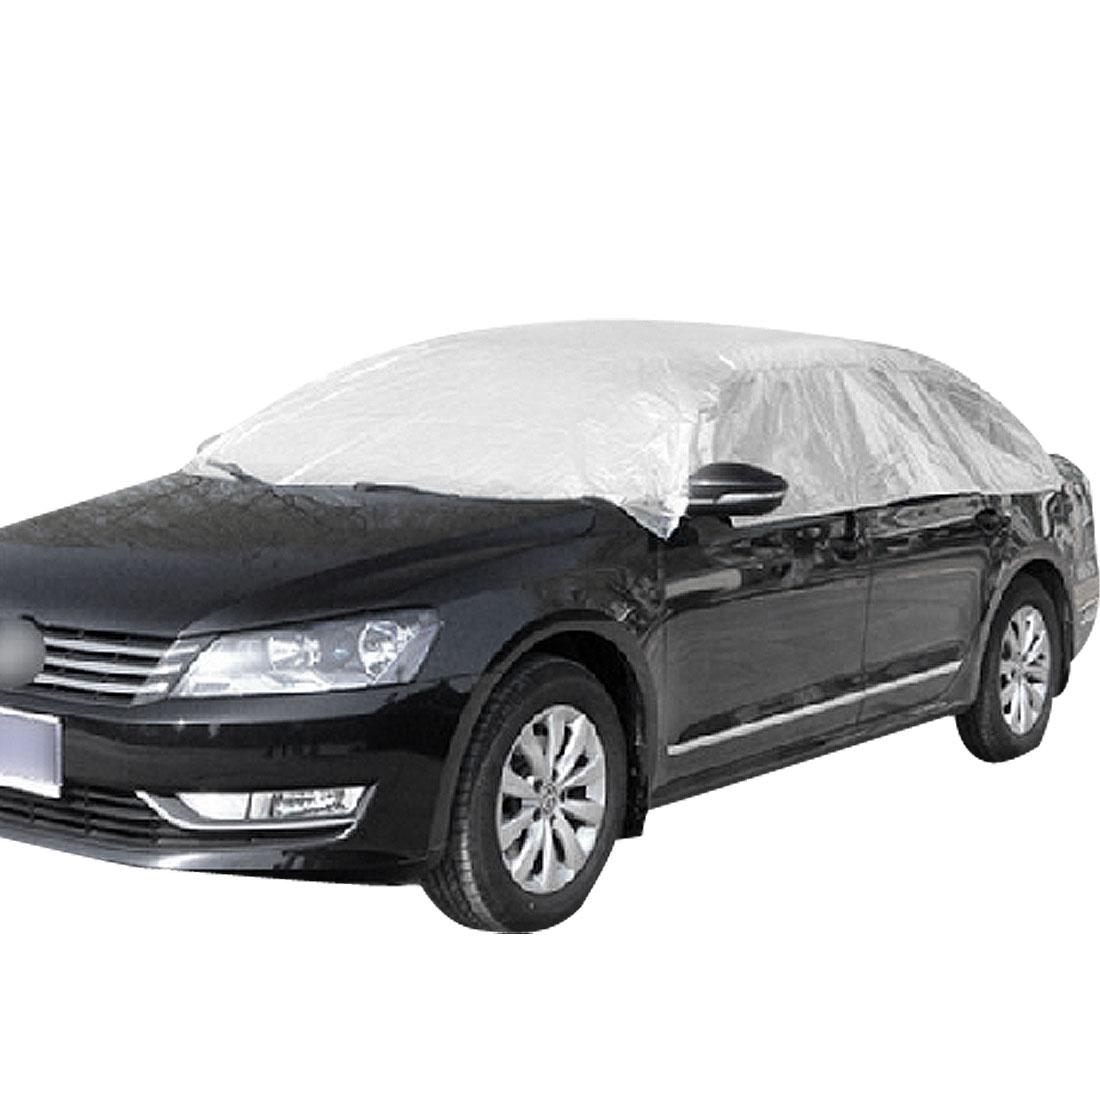 470 x 450cm Silver Tone Non-woven Reflective Half Cover Protector for Auto Car